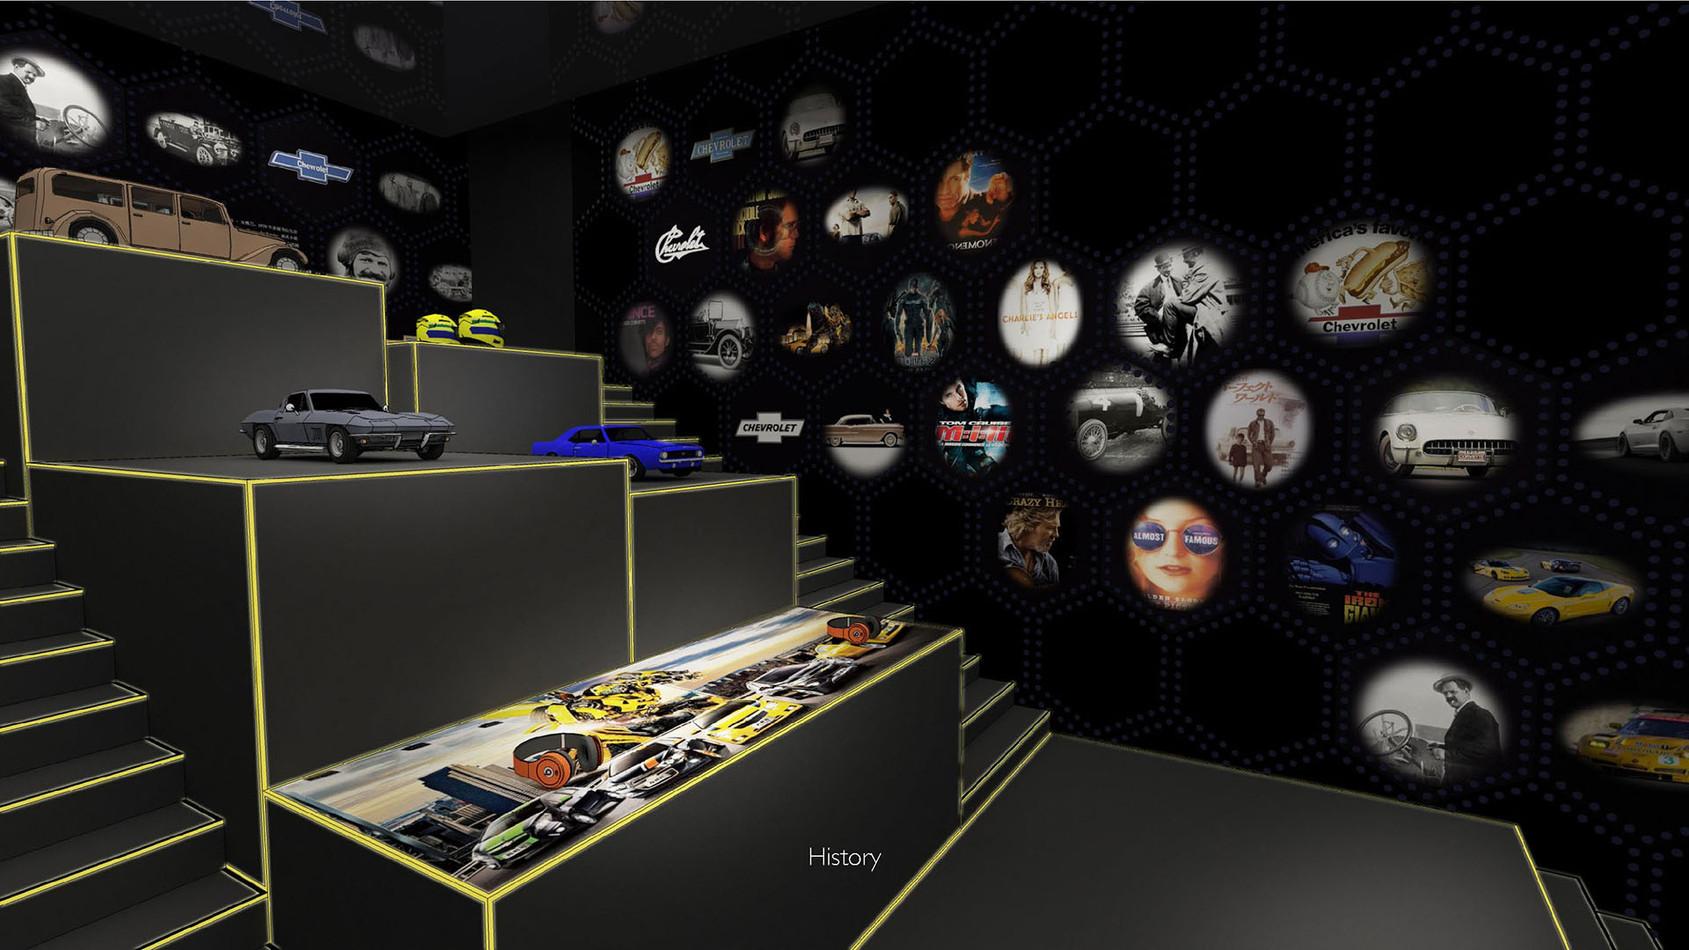 SGM-CORPORATE-MUSEUM-EN 45.jpg